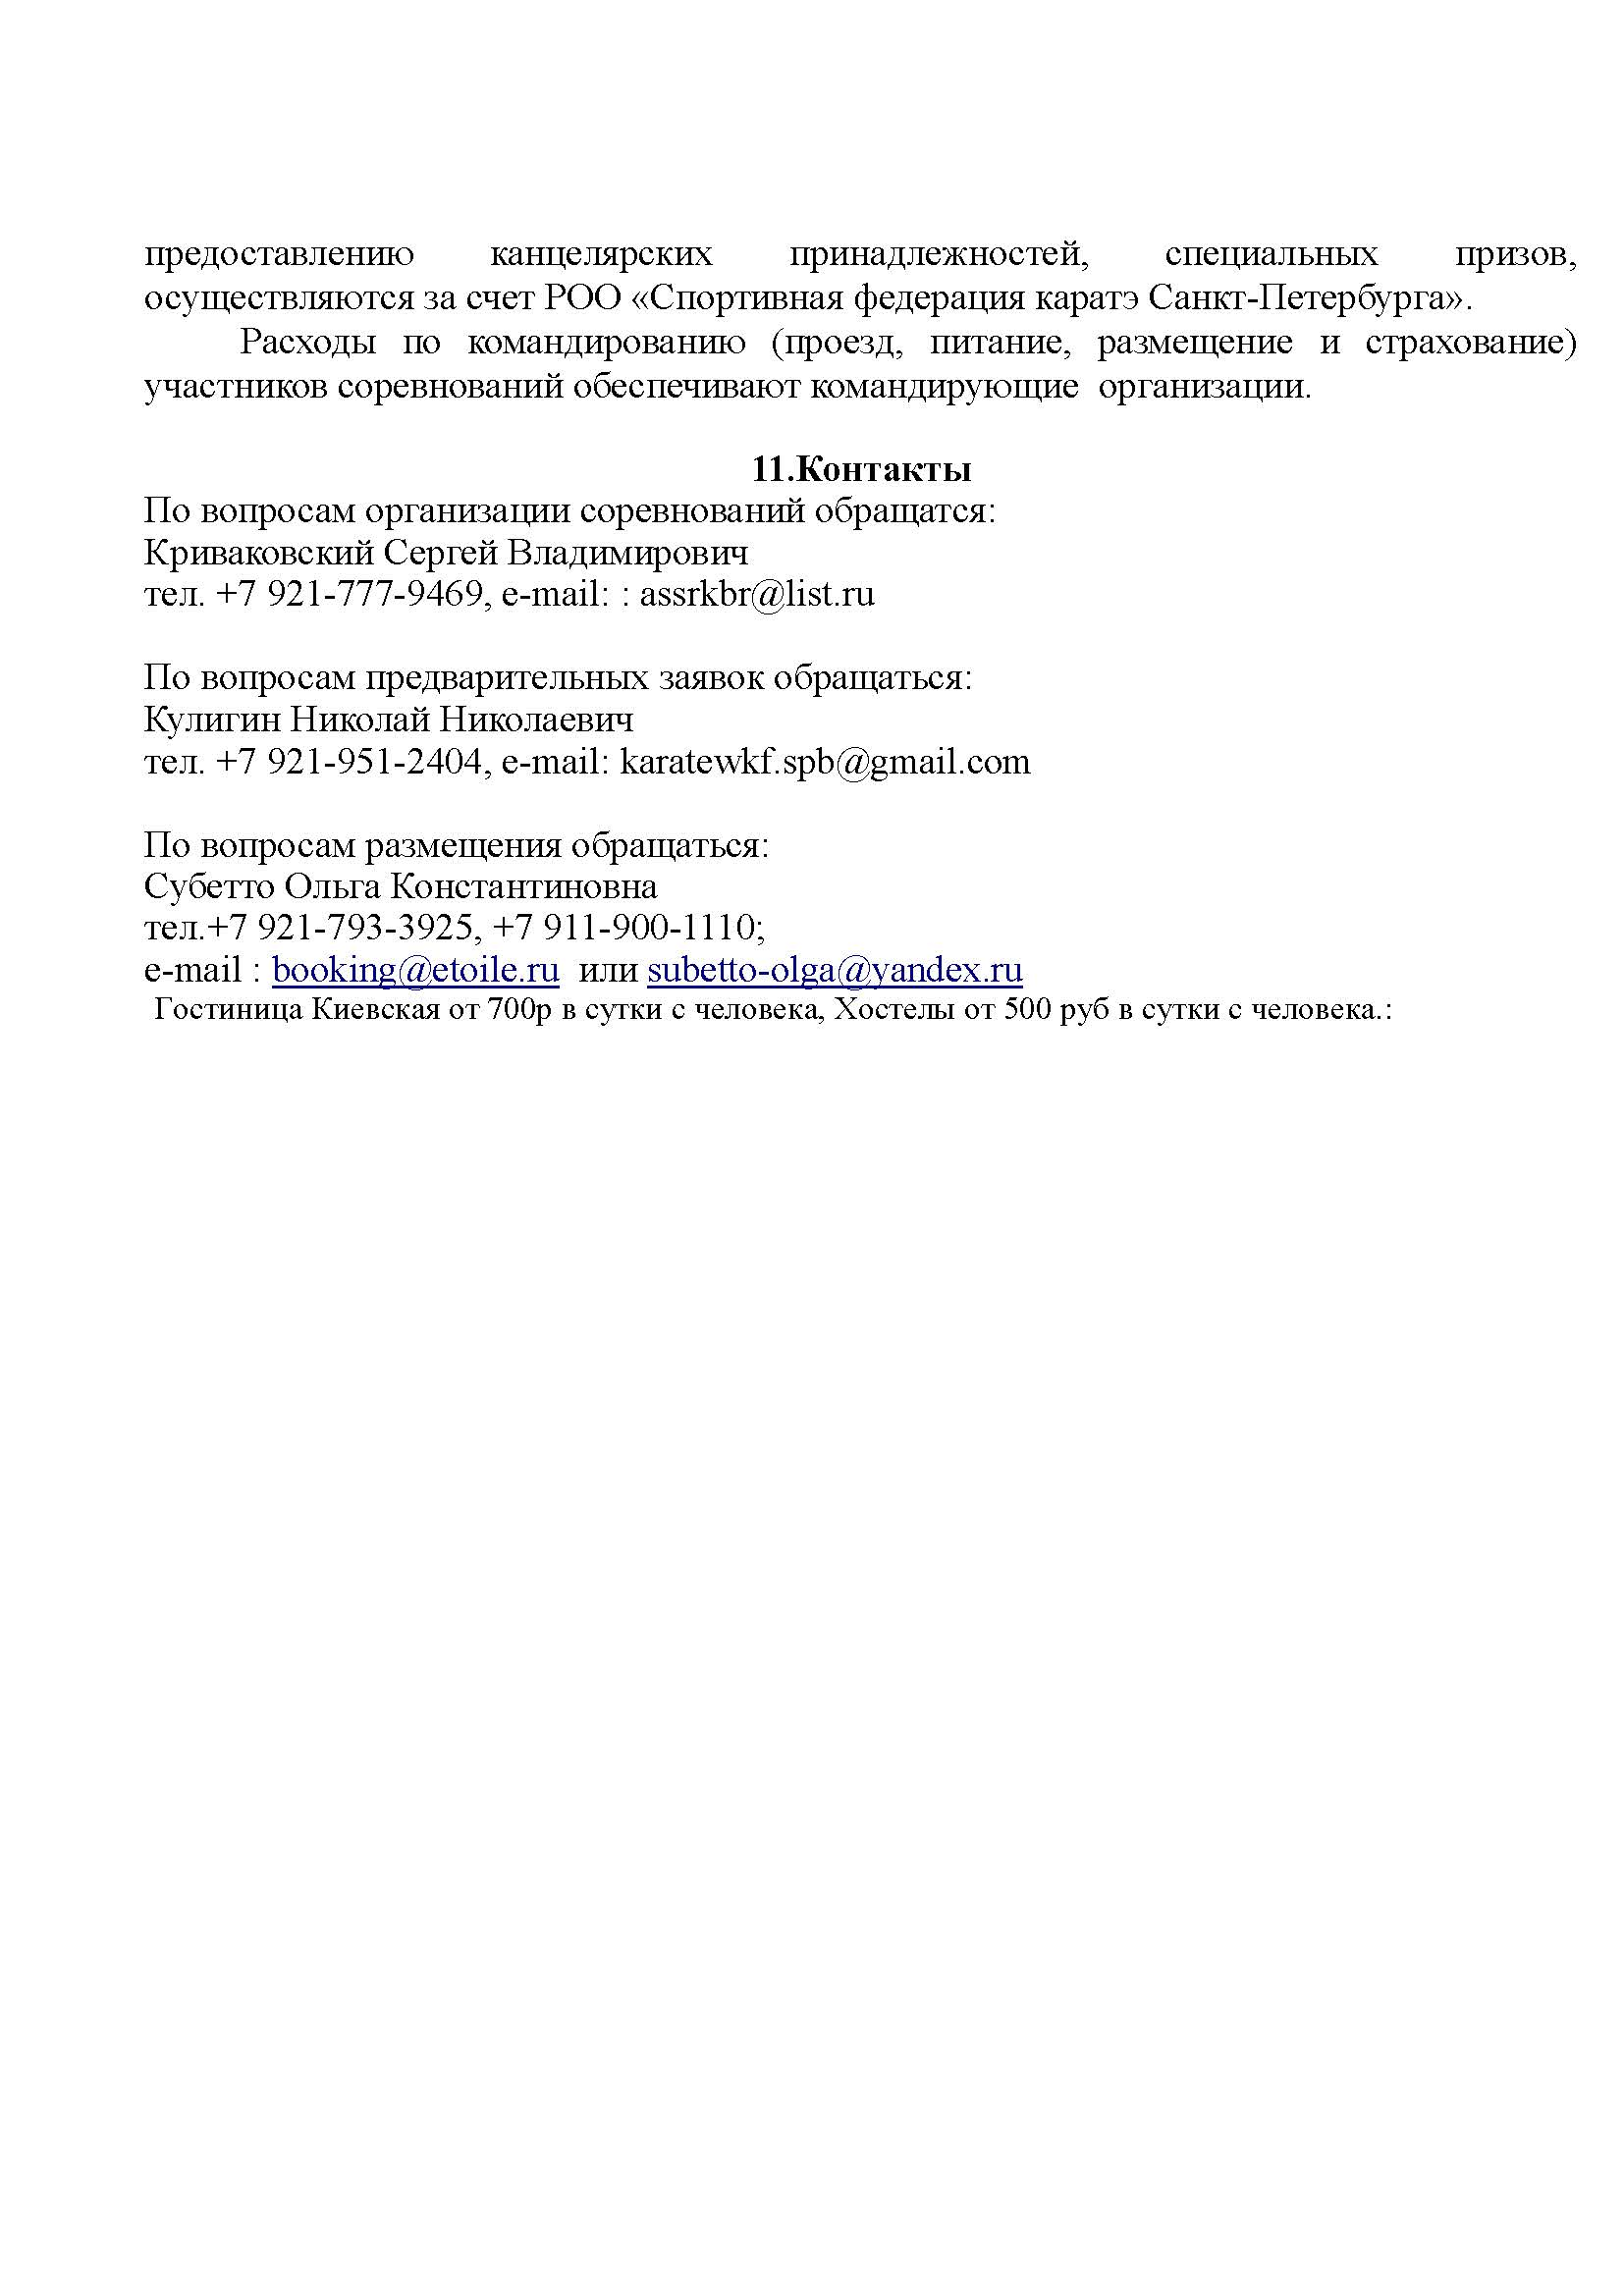 PS-2017-001-ВС_Страница_6